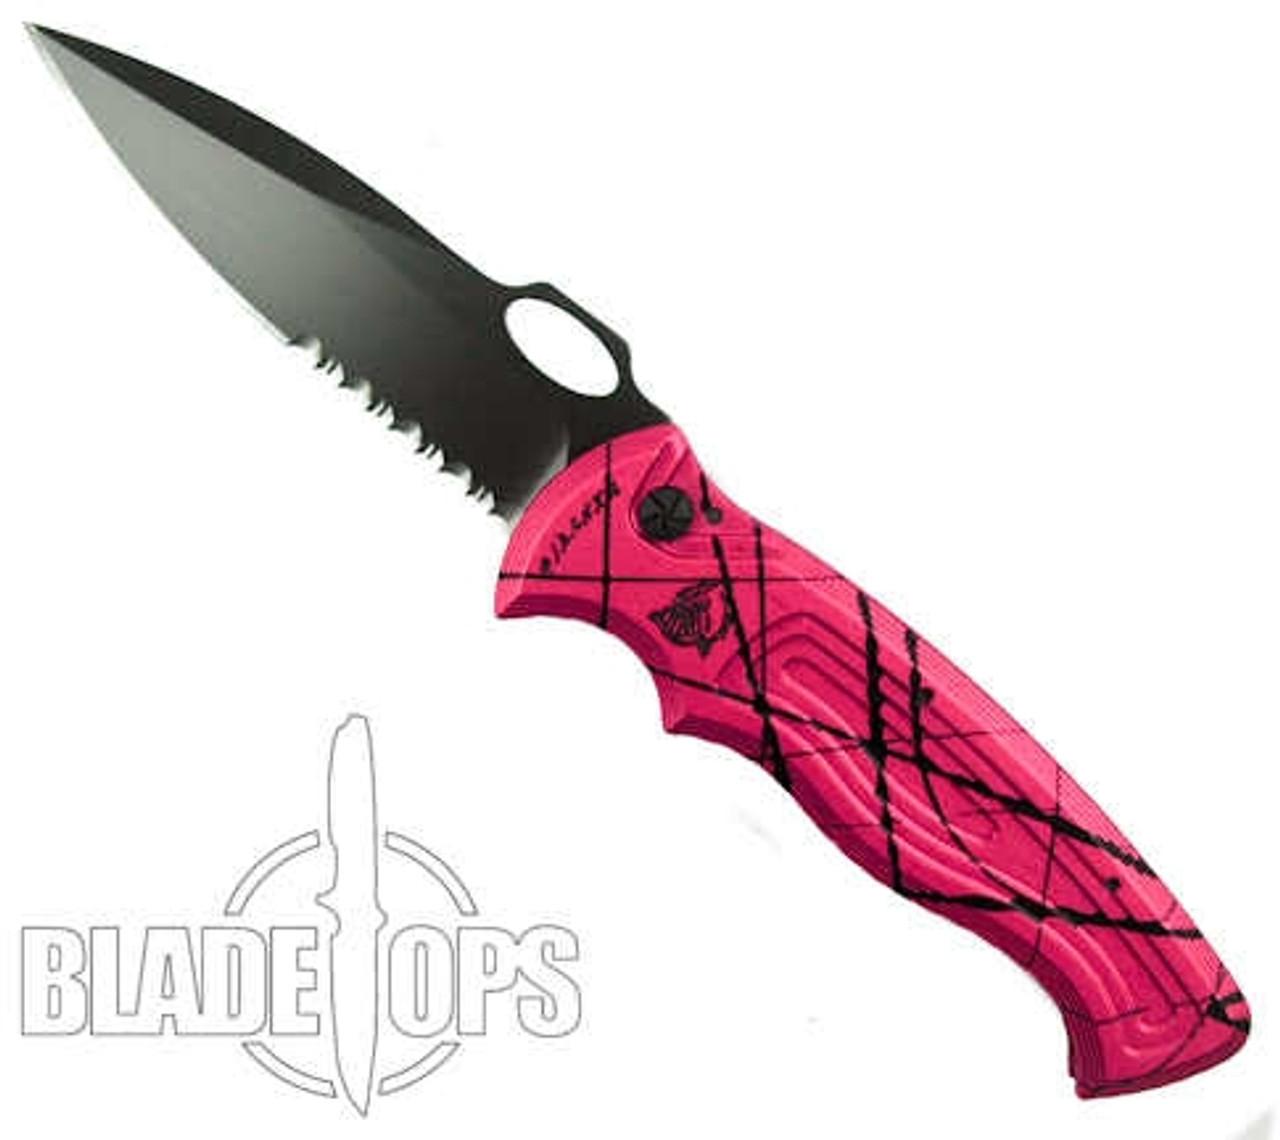 Piranha Pink Hybrid Auto Knife, 154CM Black Combo Blade